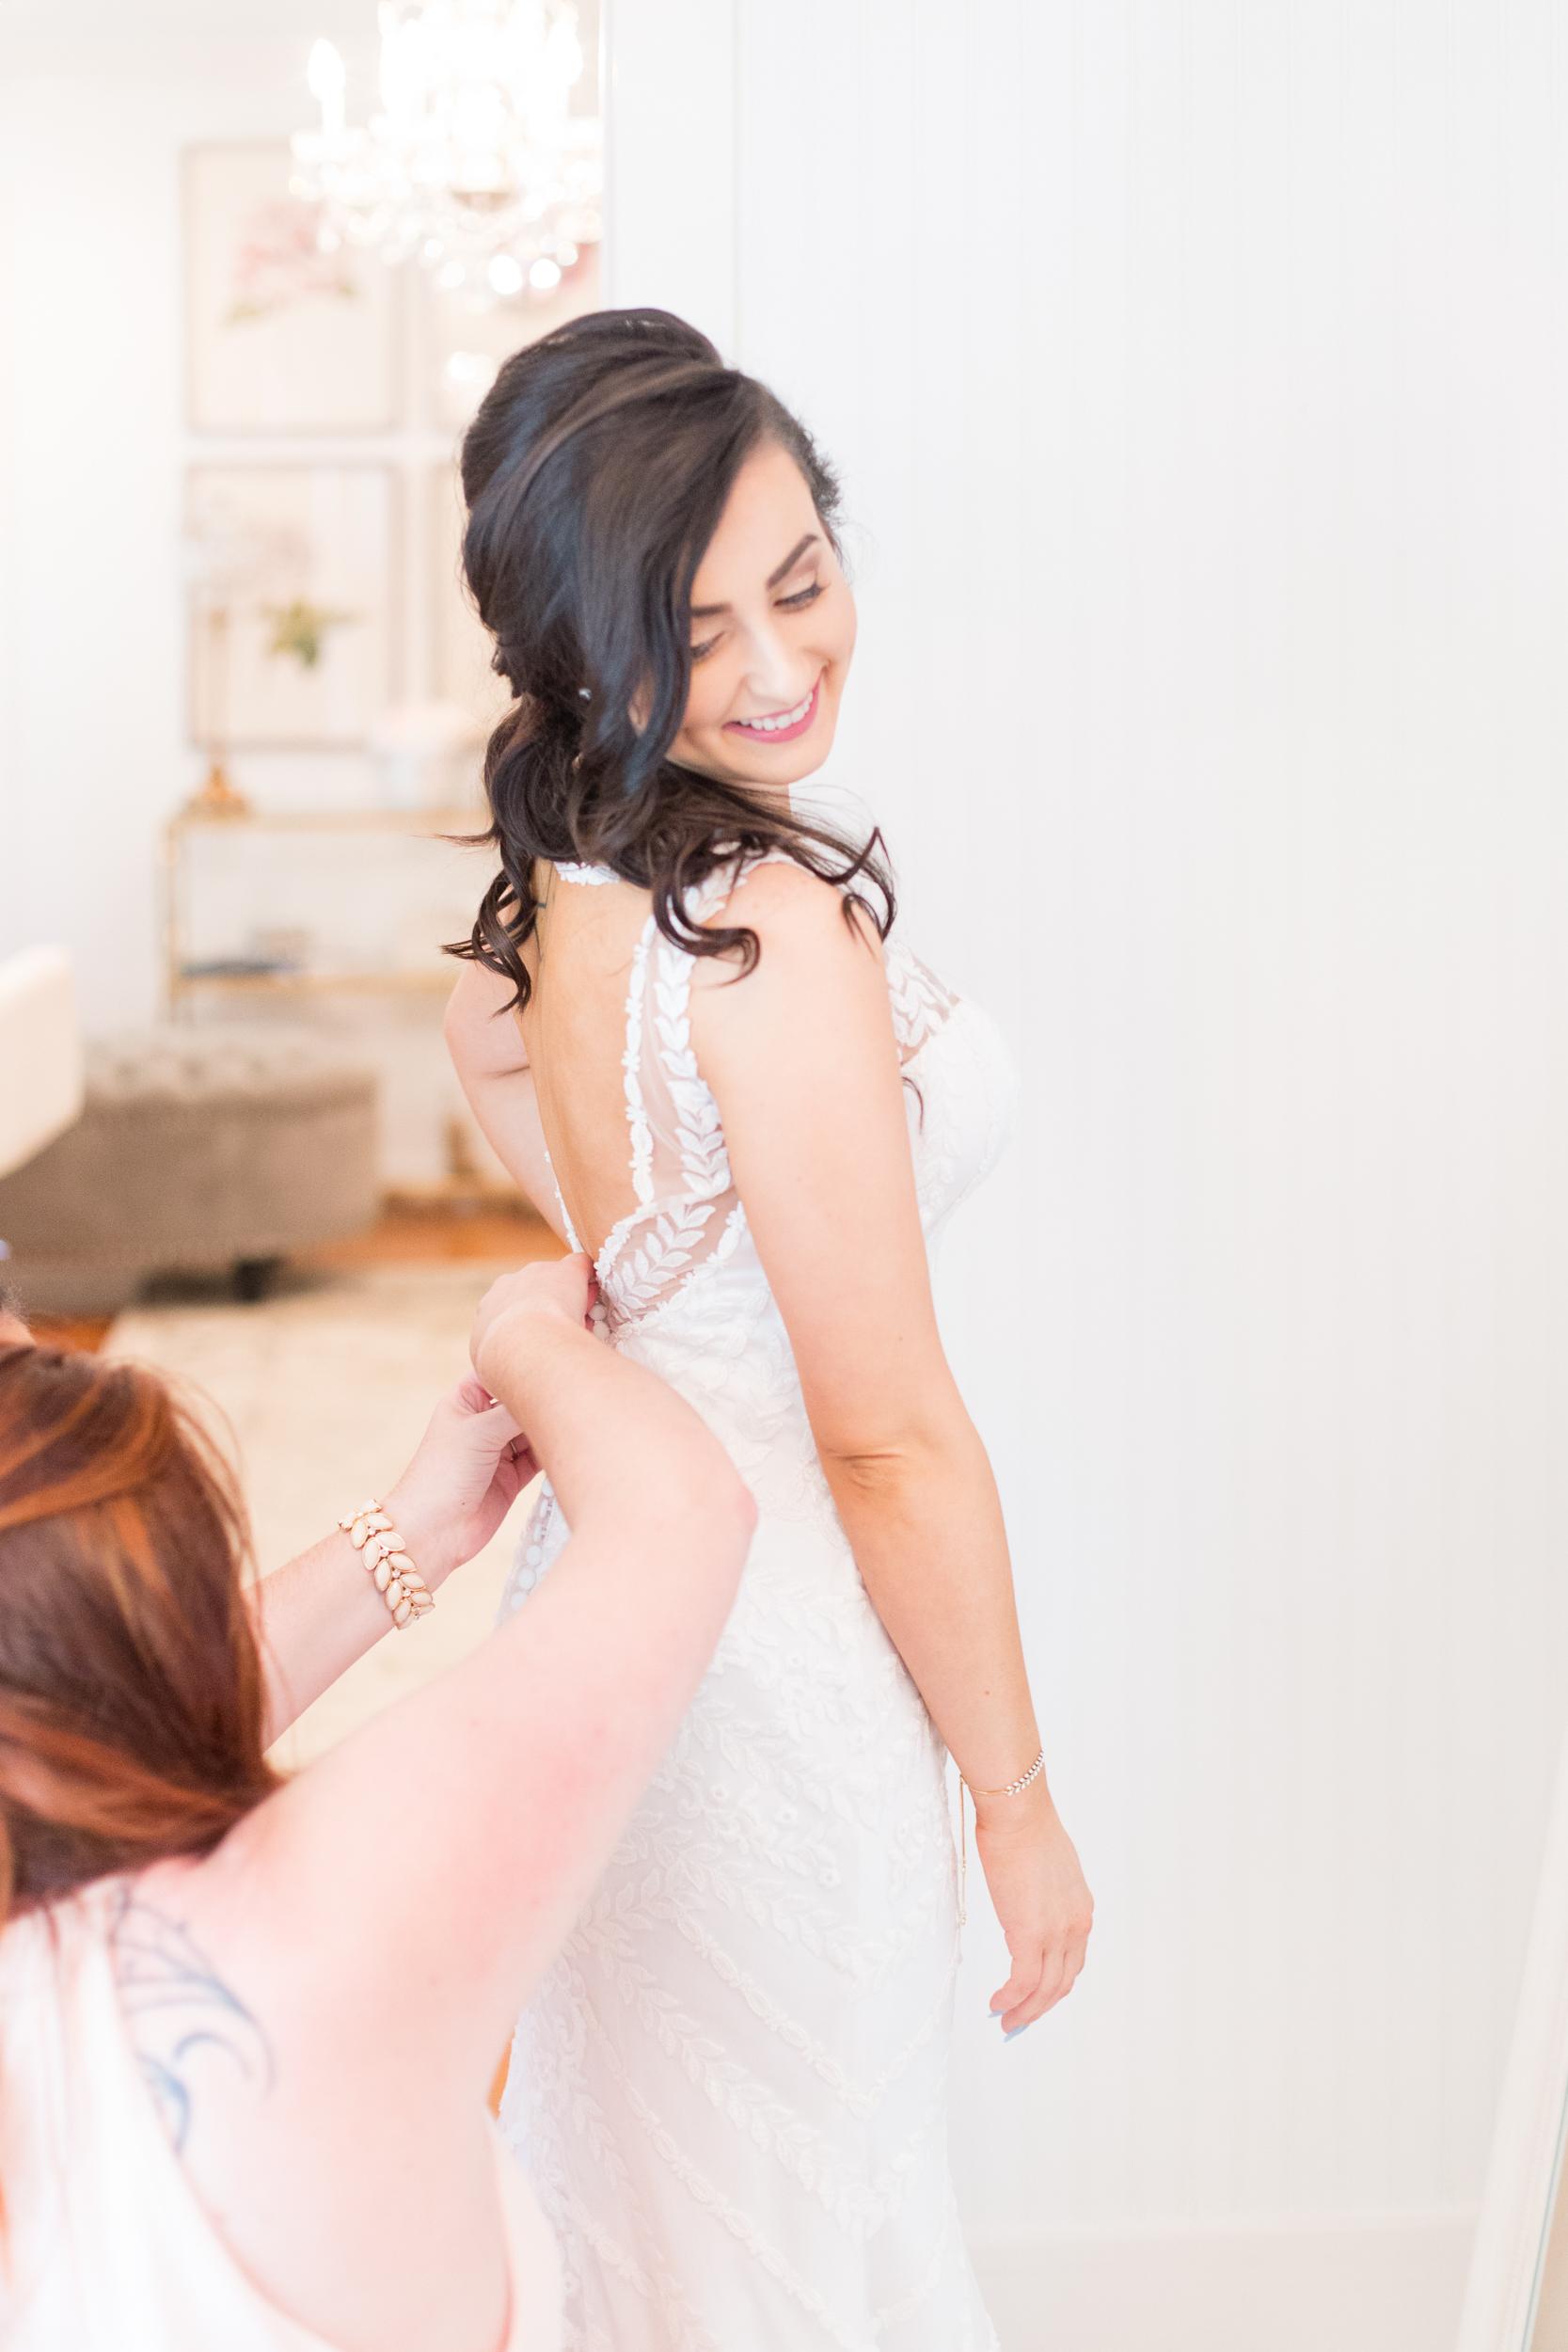 Zihlman-East TX Wedding_Kelsie Hendricks Photography_The Folmar Tyler Texas-57.jpg